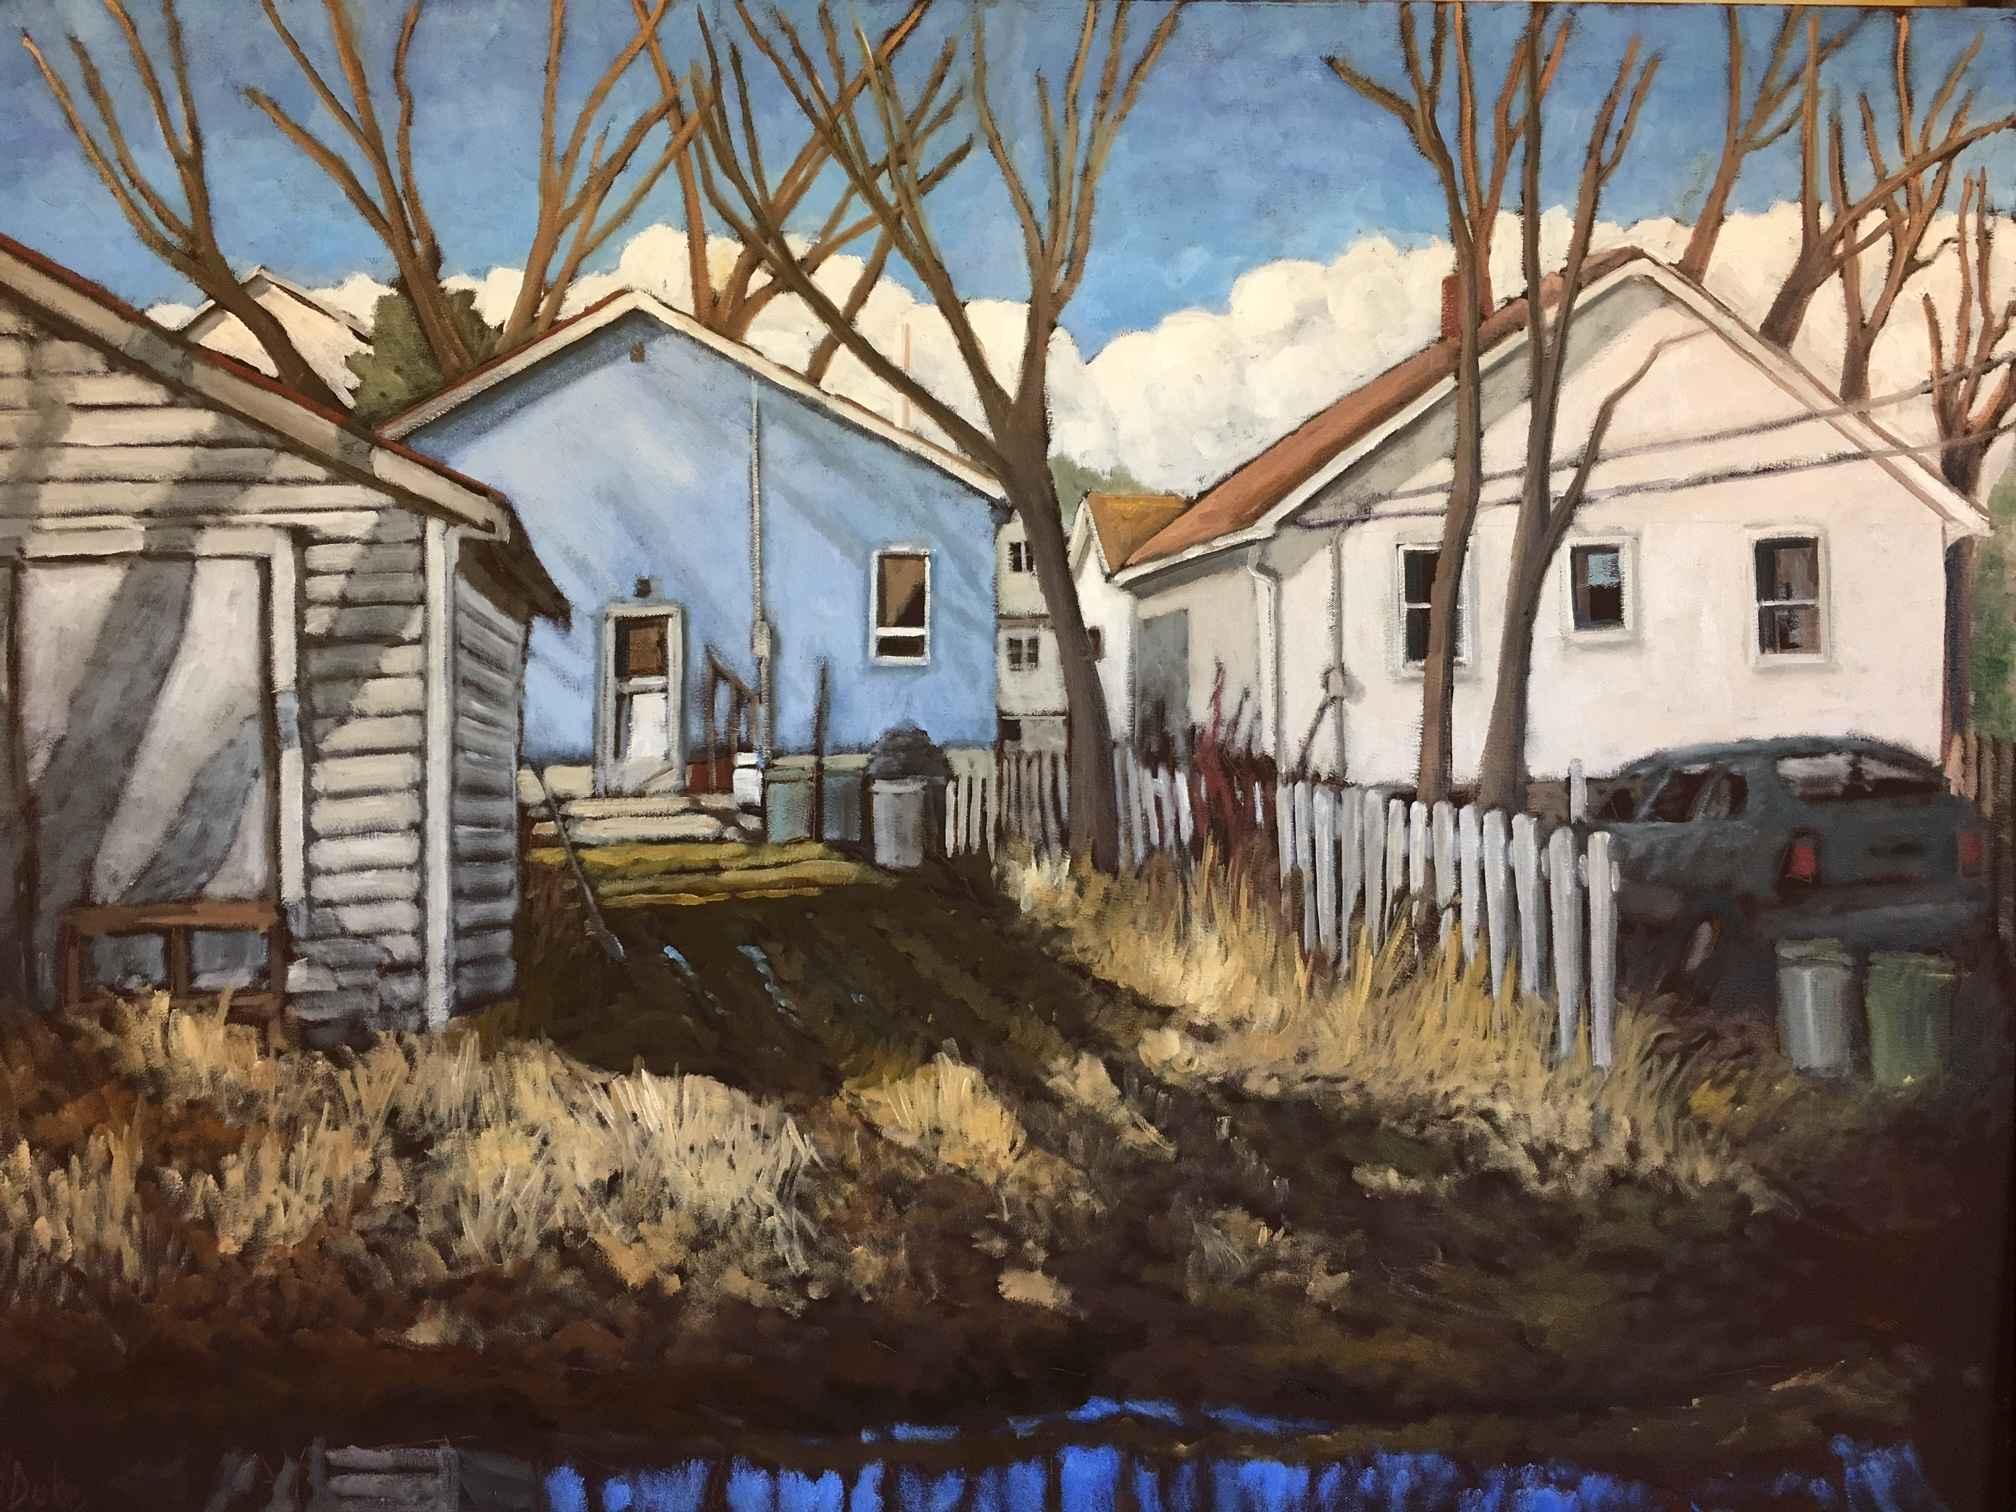 The Little Blue House by  Kari Duke - Masterpiece Online